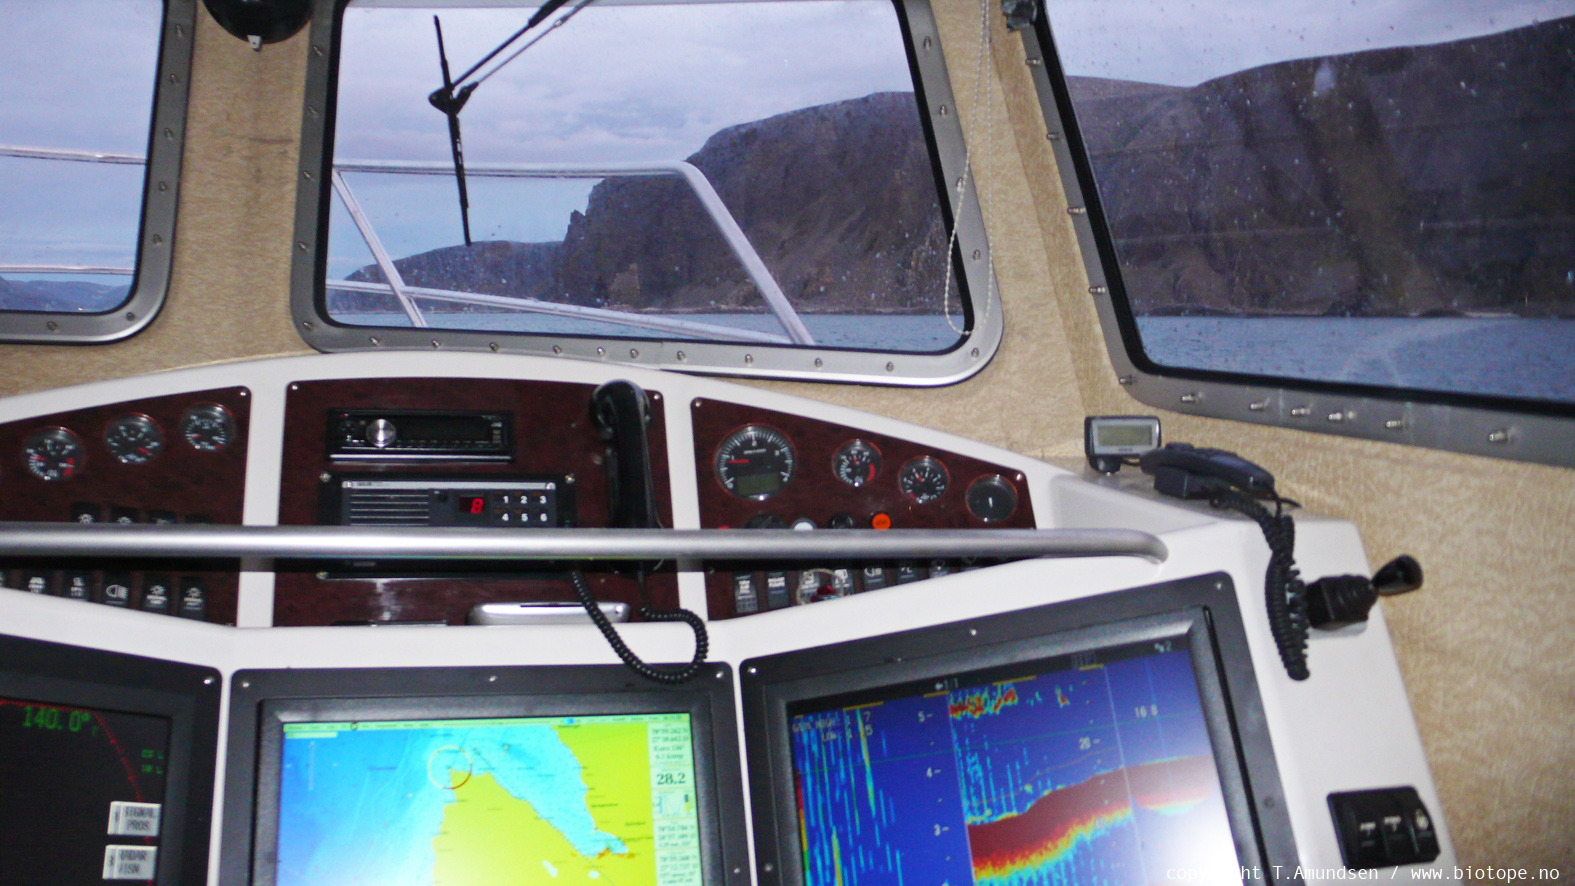 fishing vessel kjollefjord TAmundsen Biotope.jpg